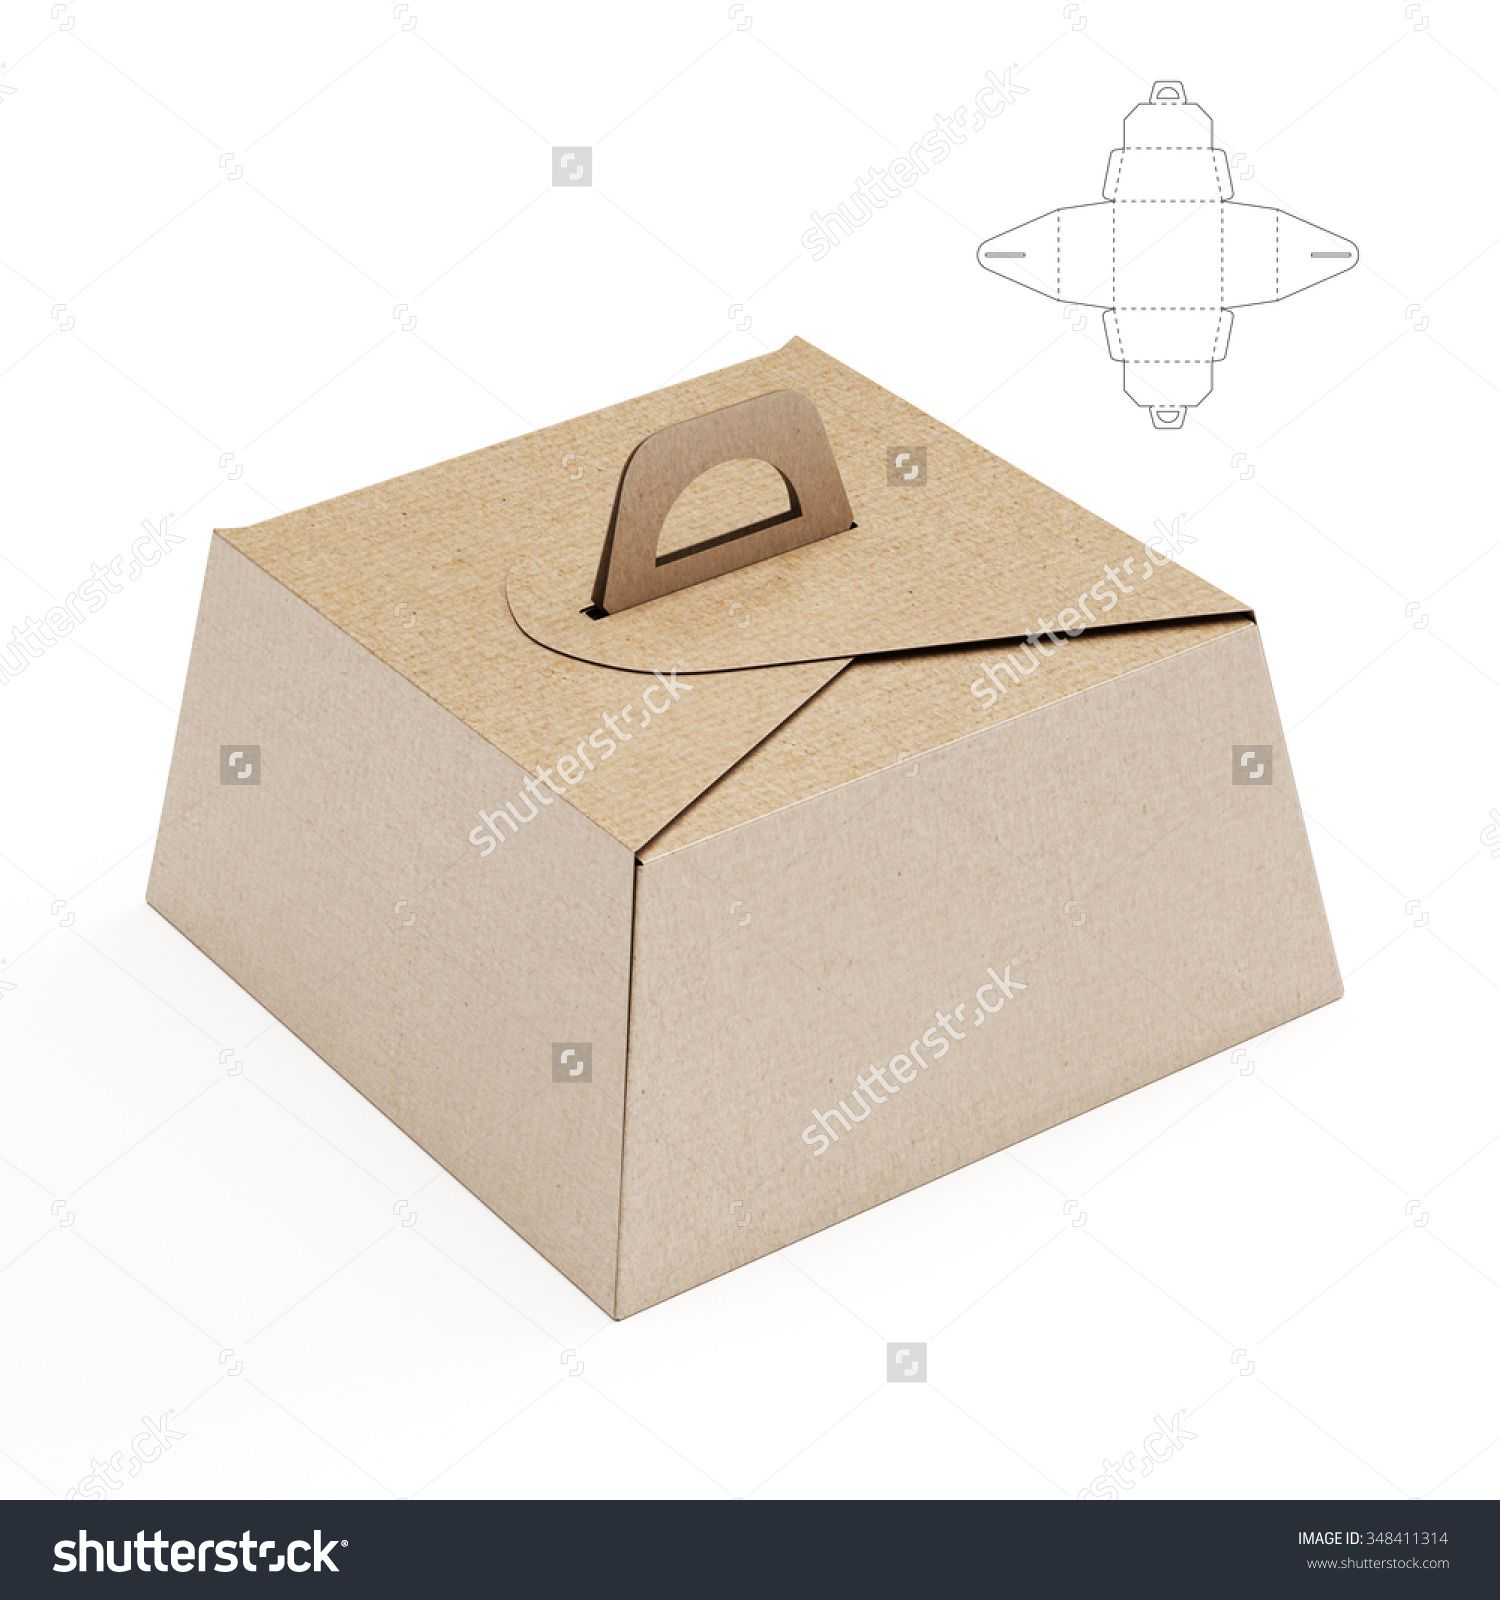 birthday cake box with handle and cut template diy birthday